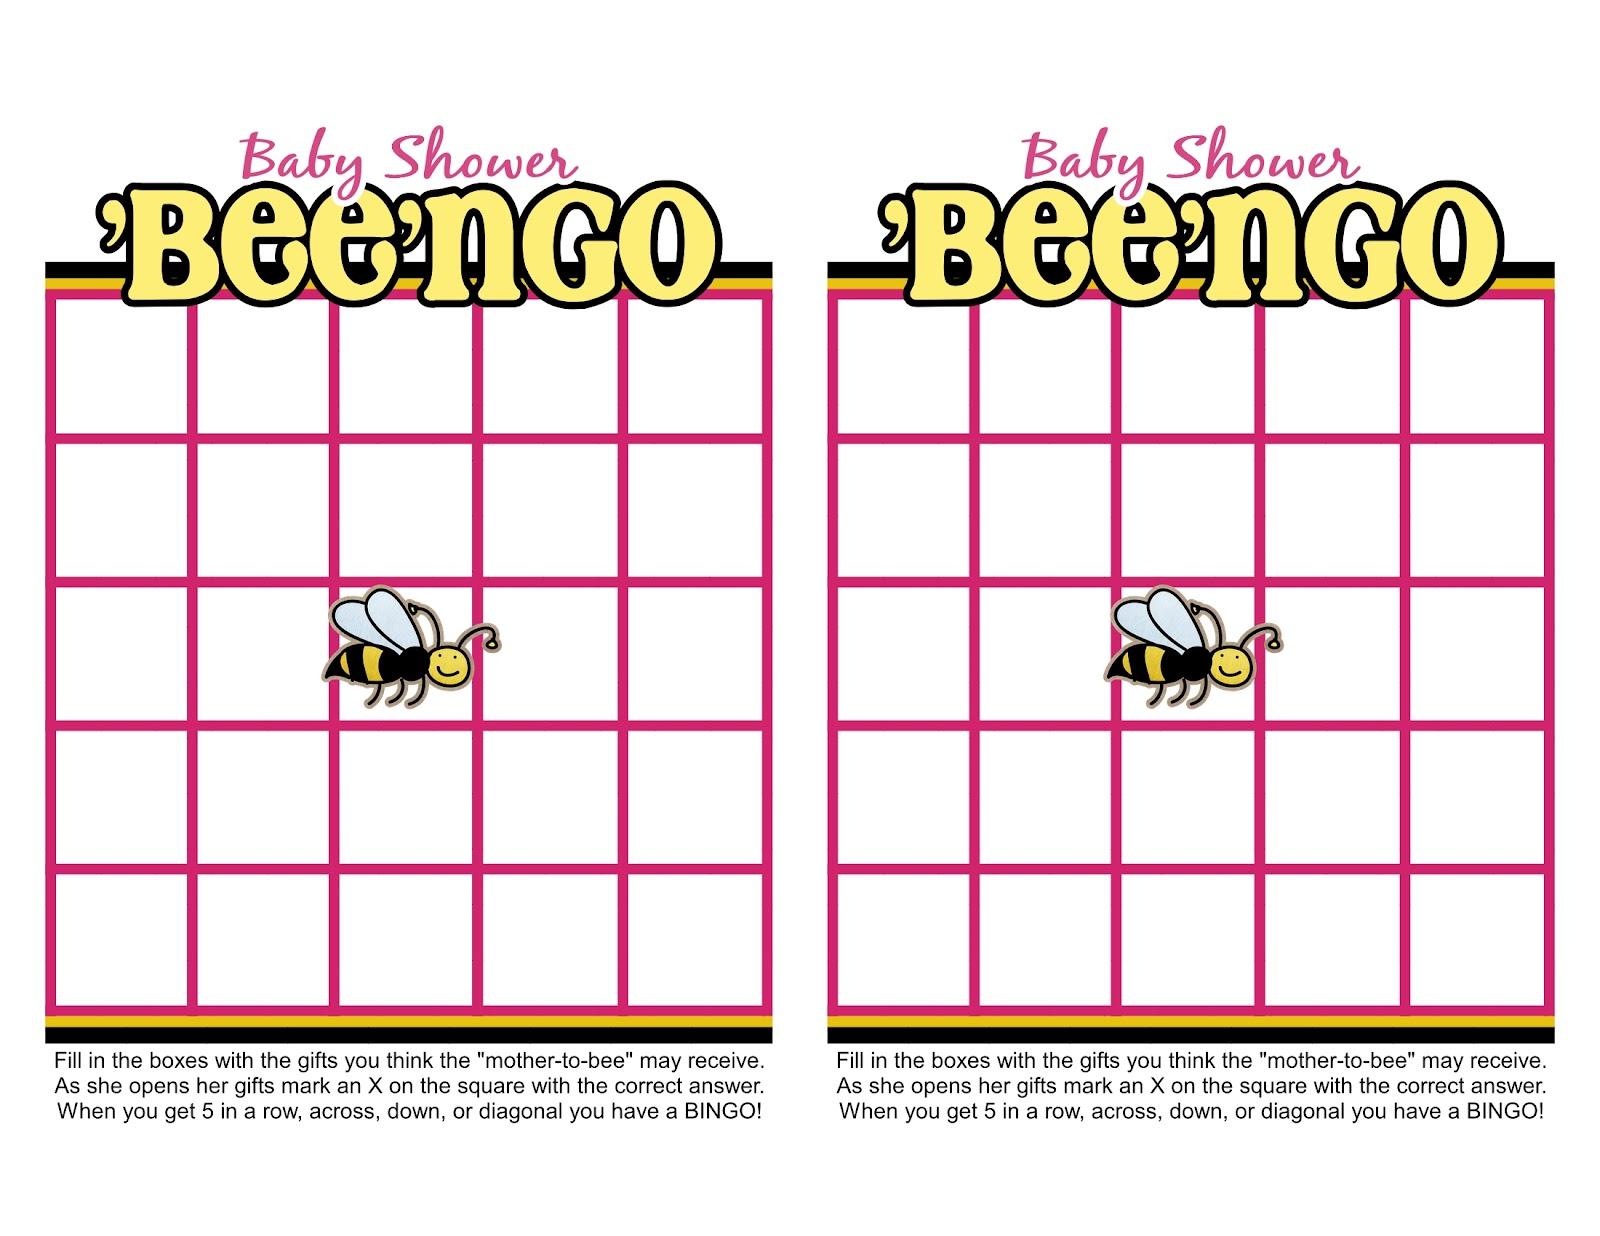 ... bingo card blank baby bingo card blank bingo card 4x4 blank bingo card